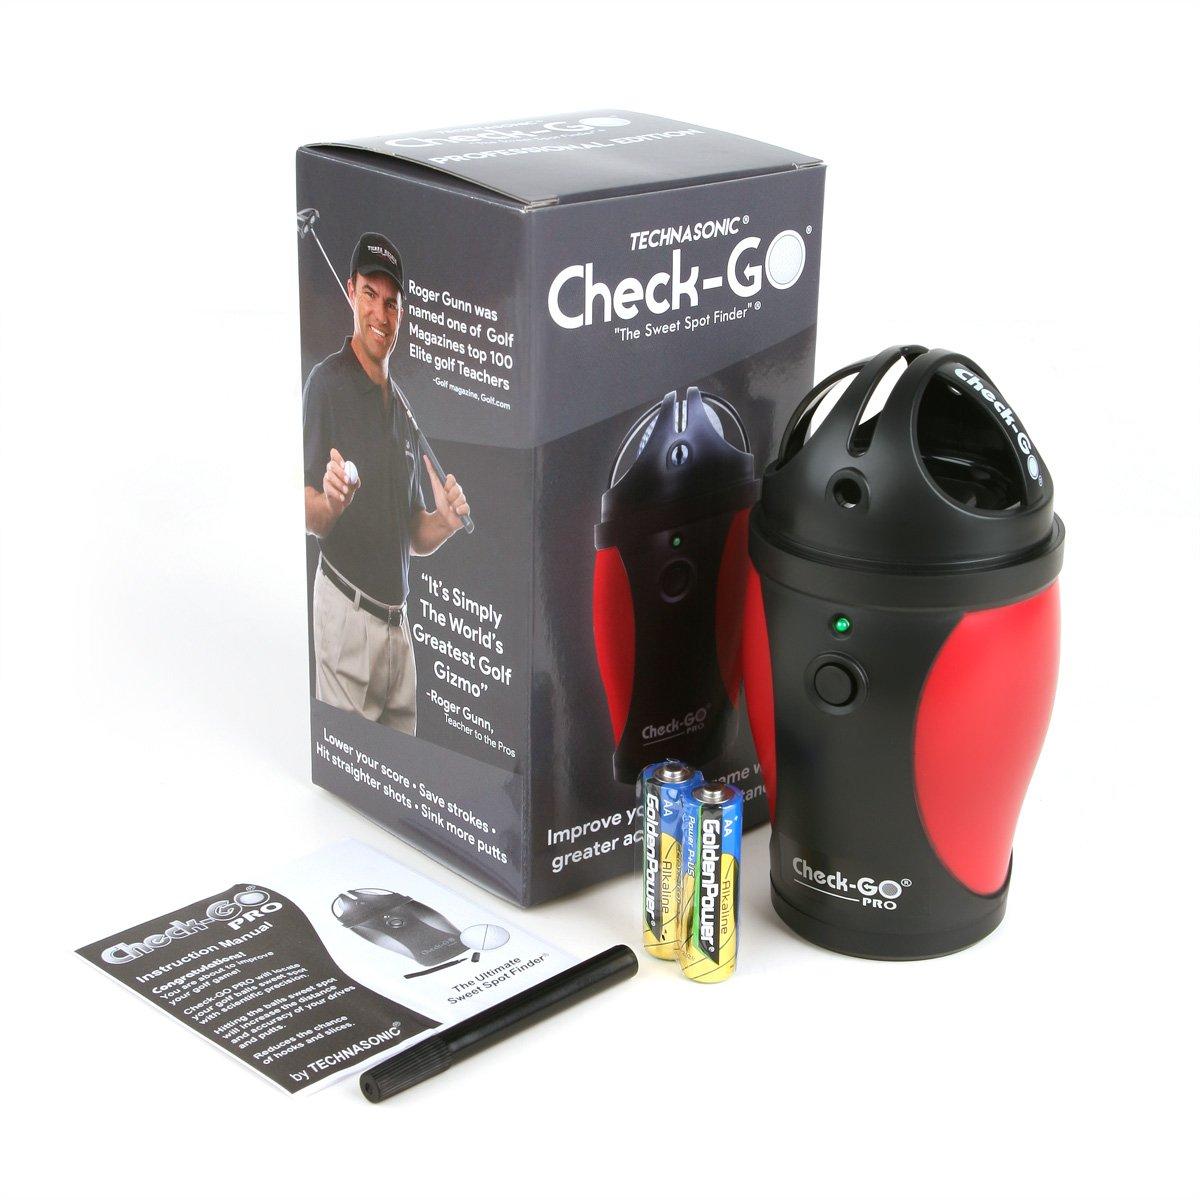 Technasonic Check-Go Pro Sweet Spot Electronic Golf Ball Liner by ProActive Sports